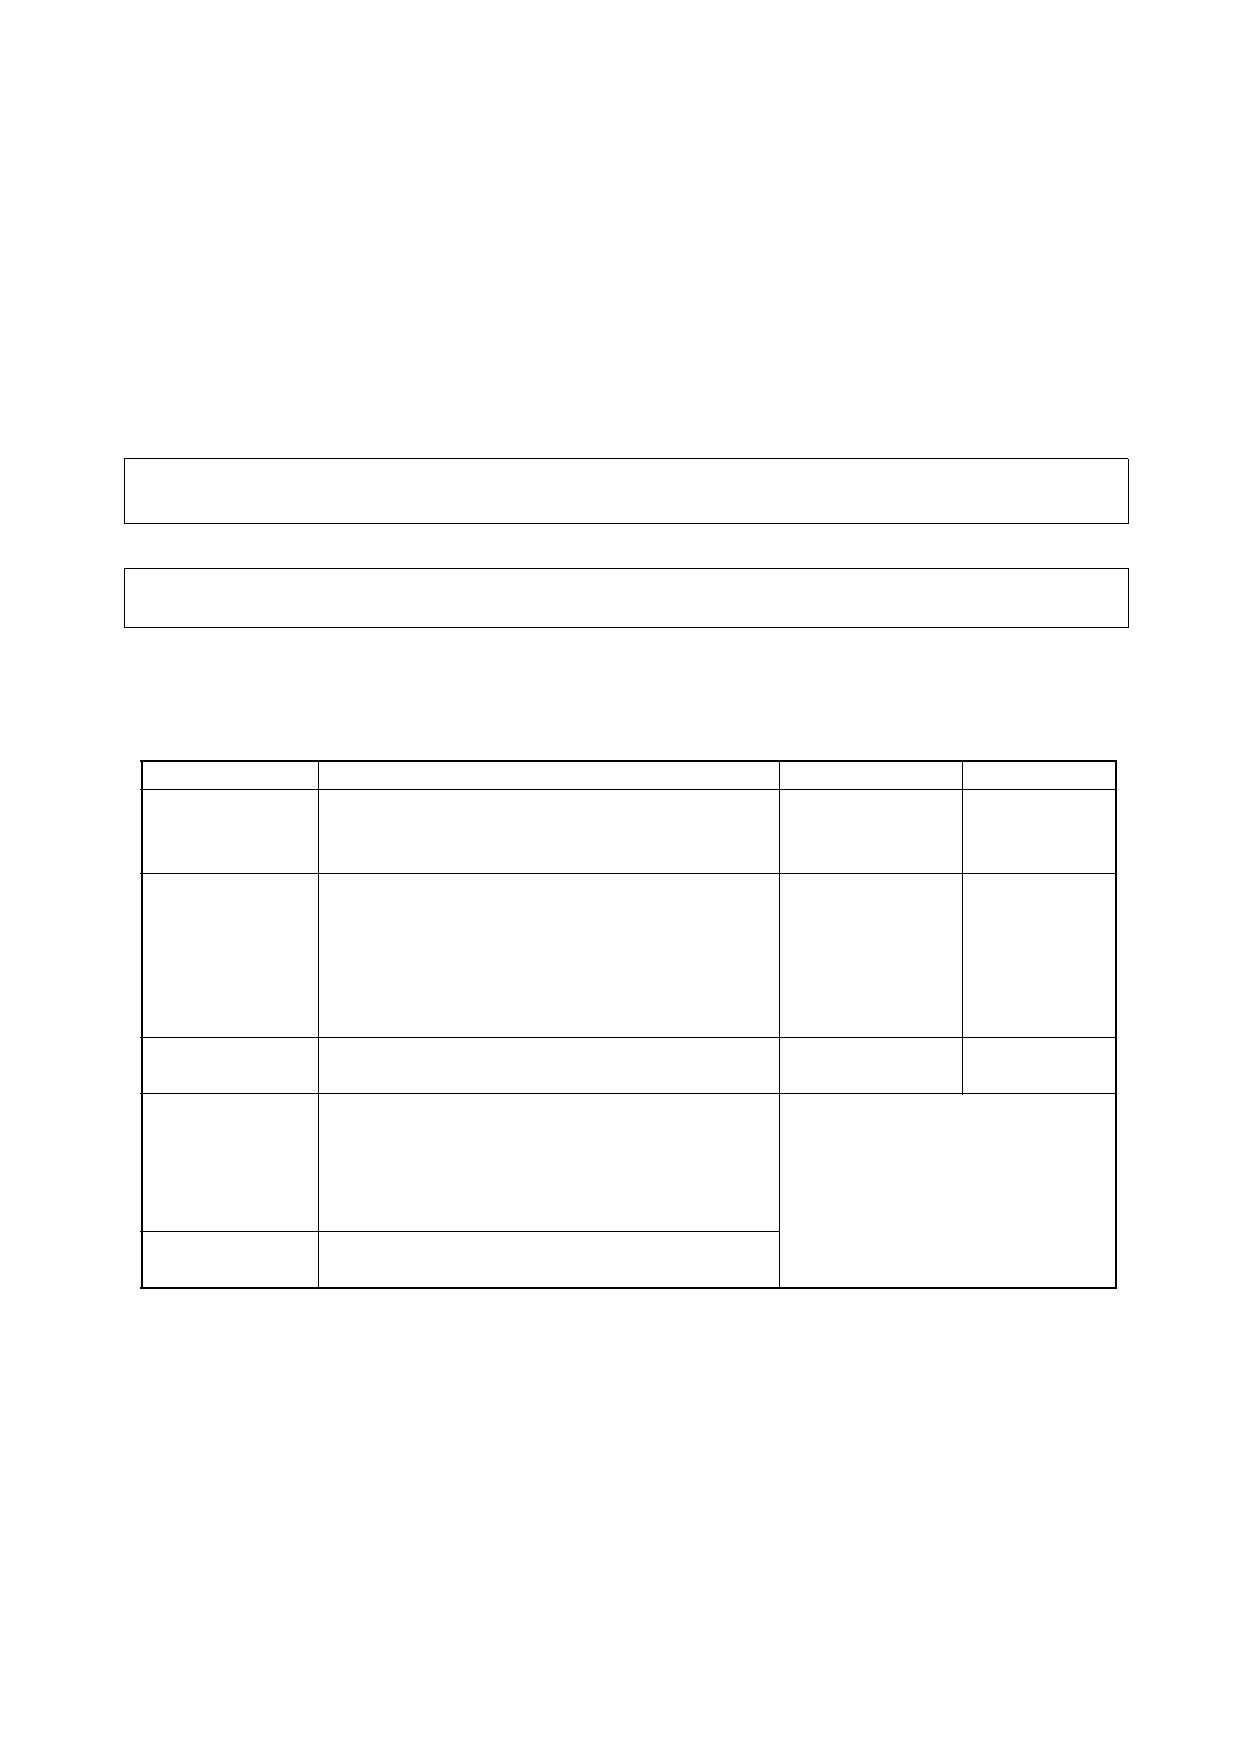 R5F21216JFP pdf, 반도체, 판매, 대치품